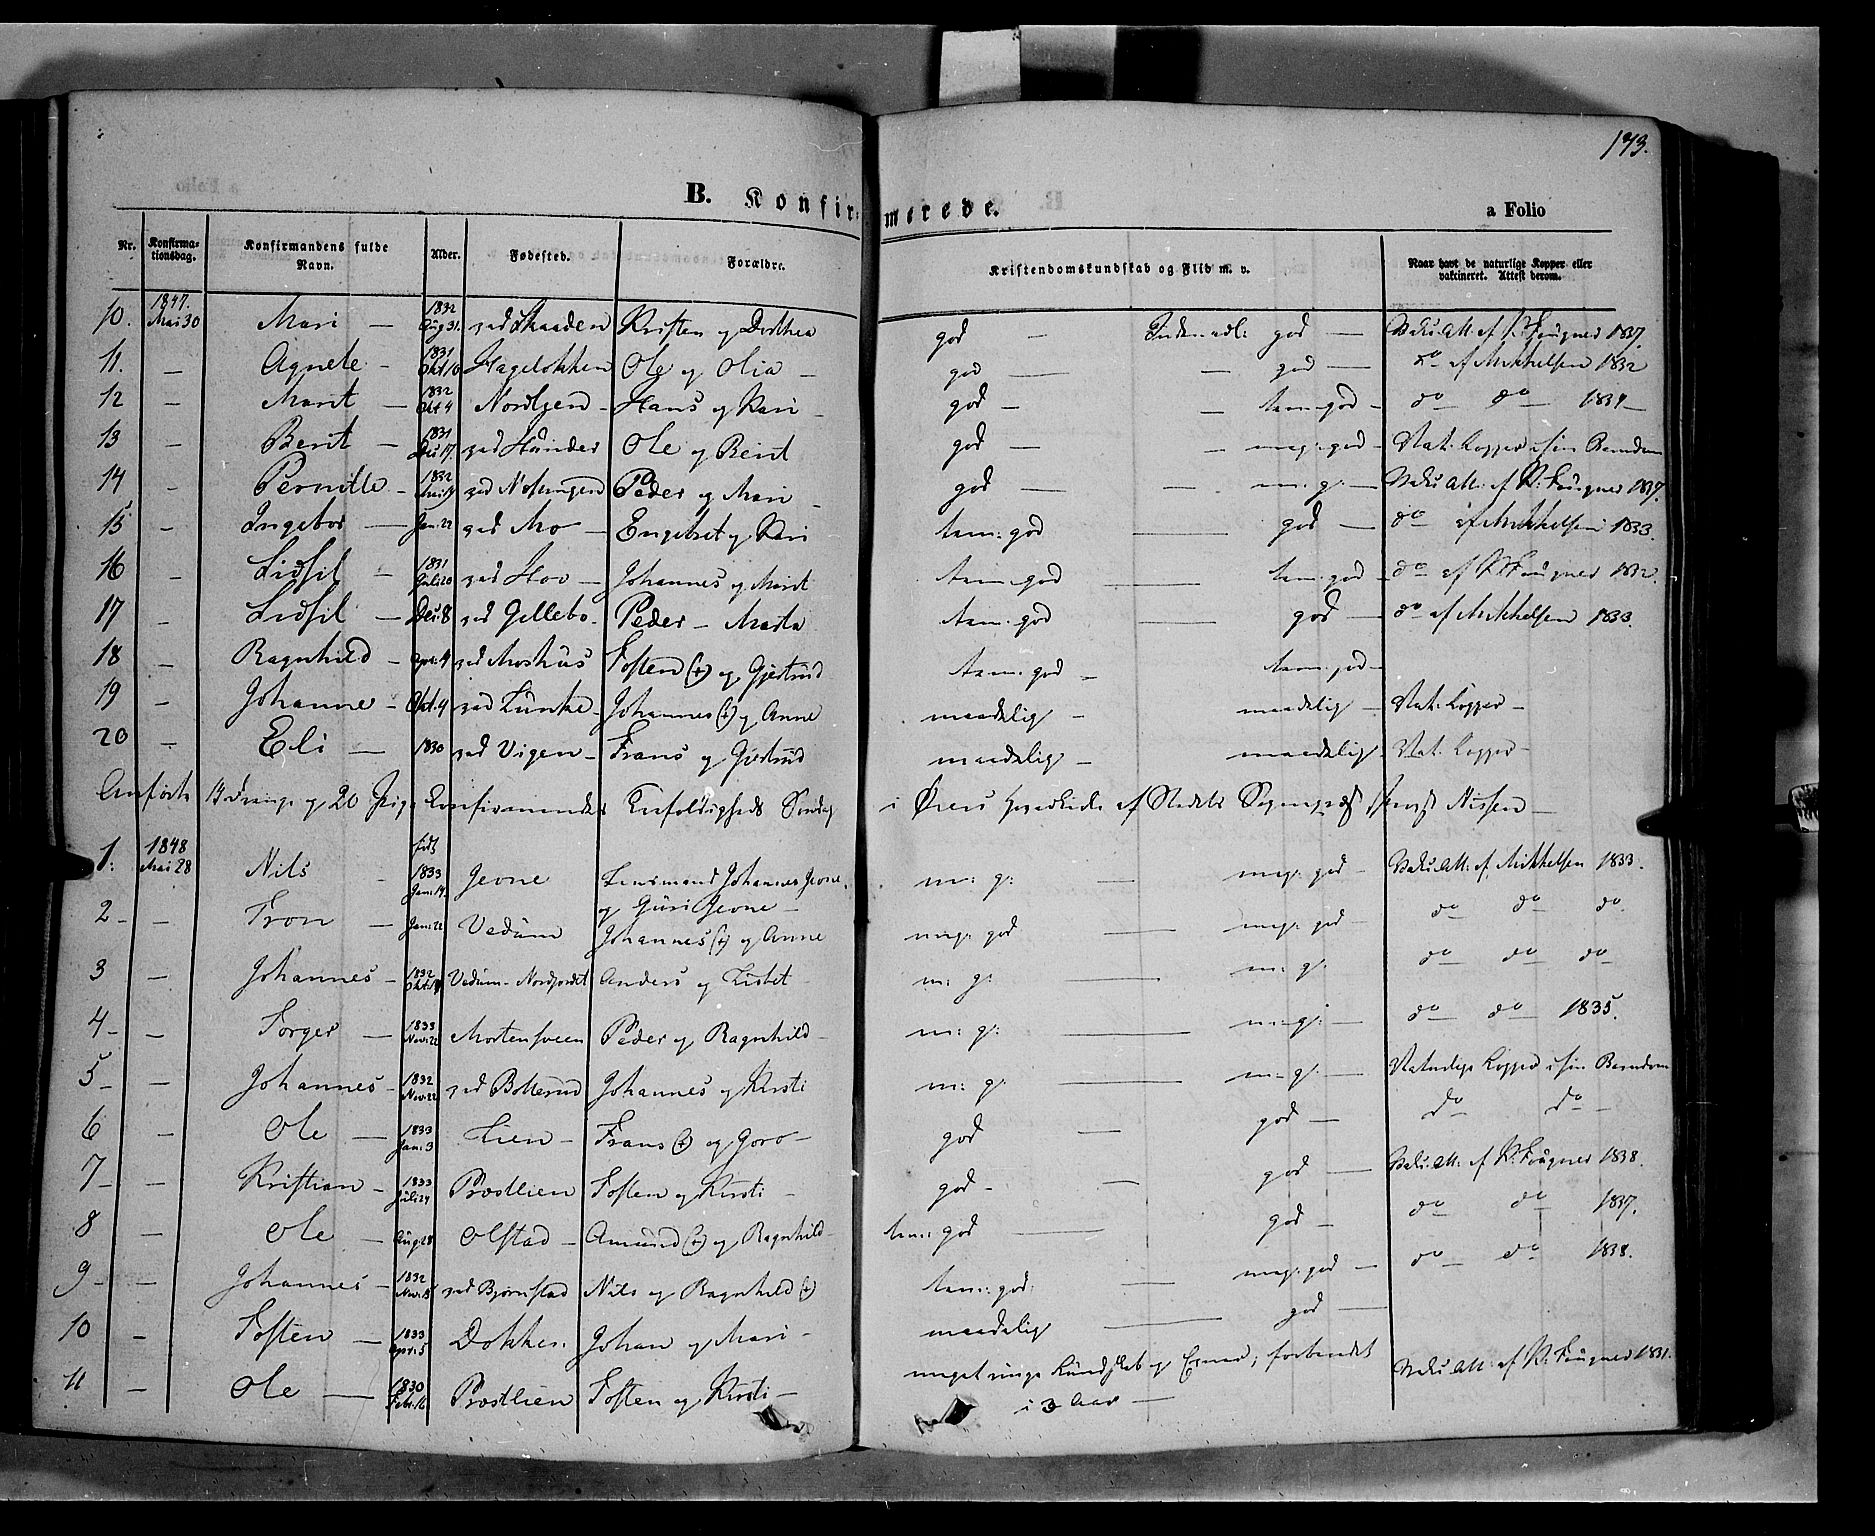 SAH, Øyer prestekontor, Parish register (official) no. 5, 1842-1857, p. 173